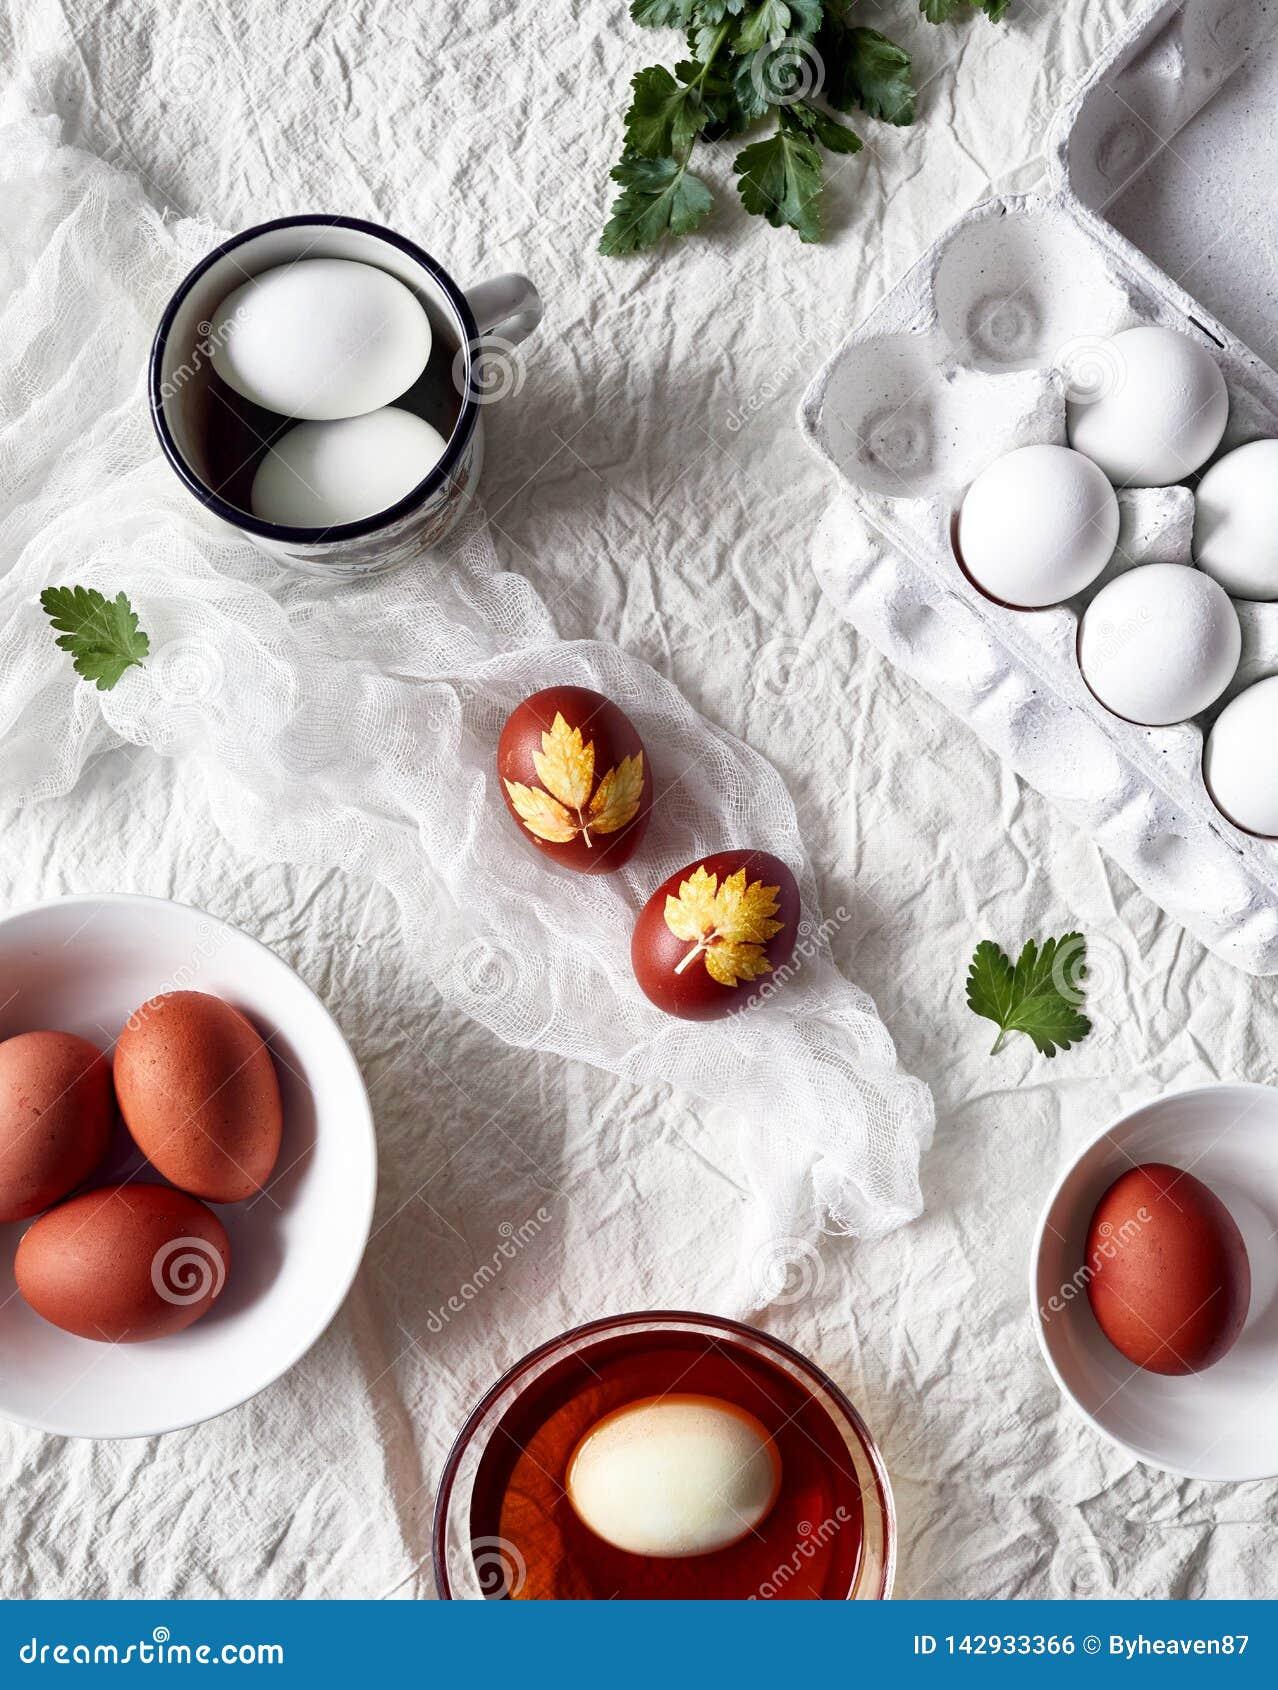 украшенные пасхальные яйца